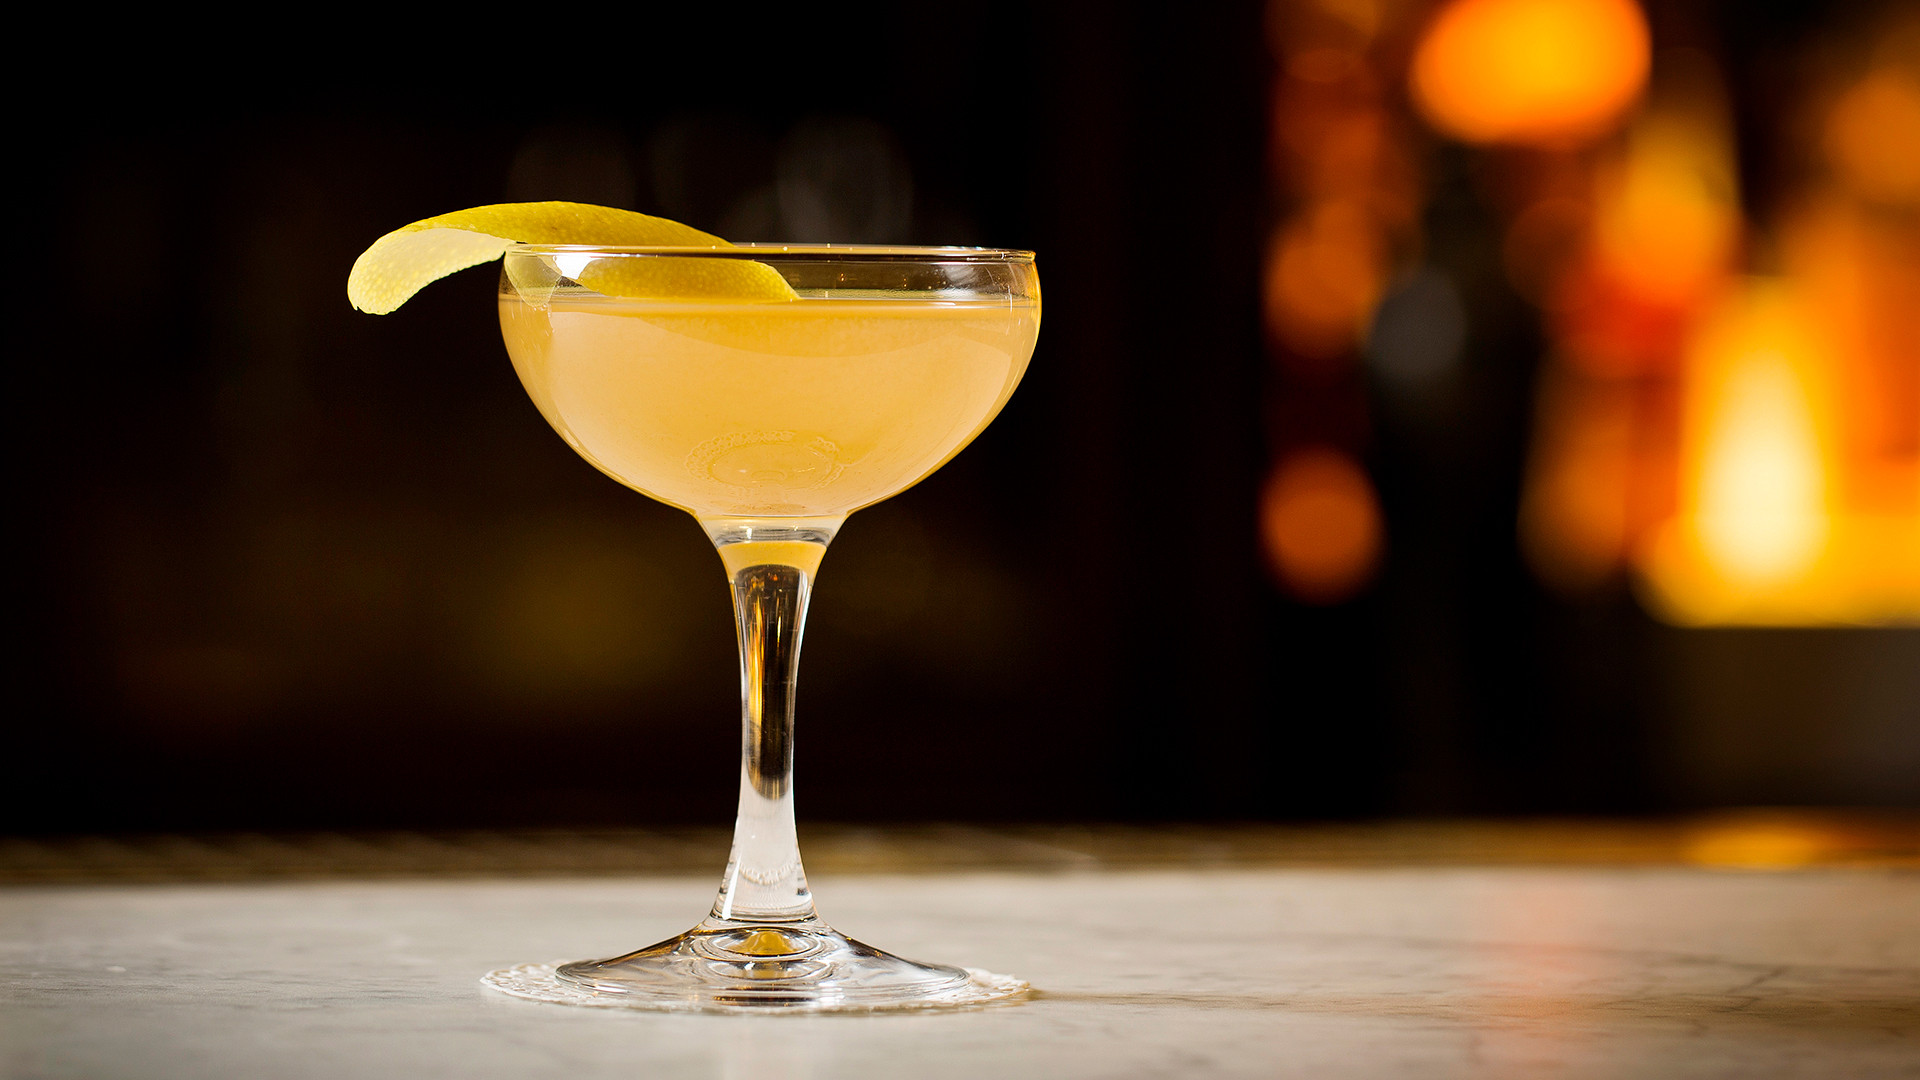 Sober martini